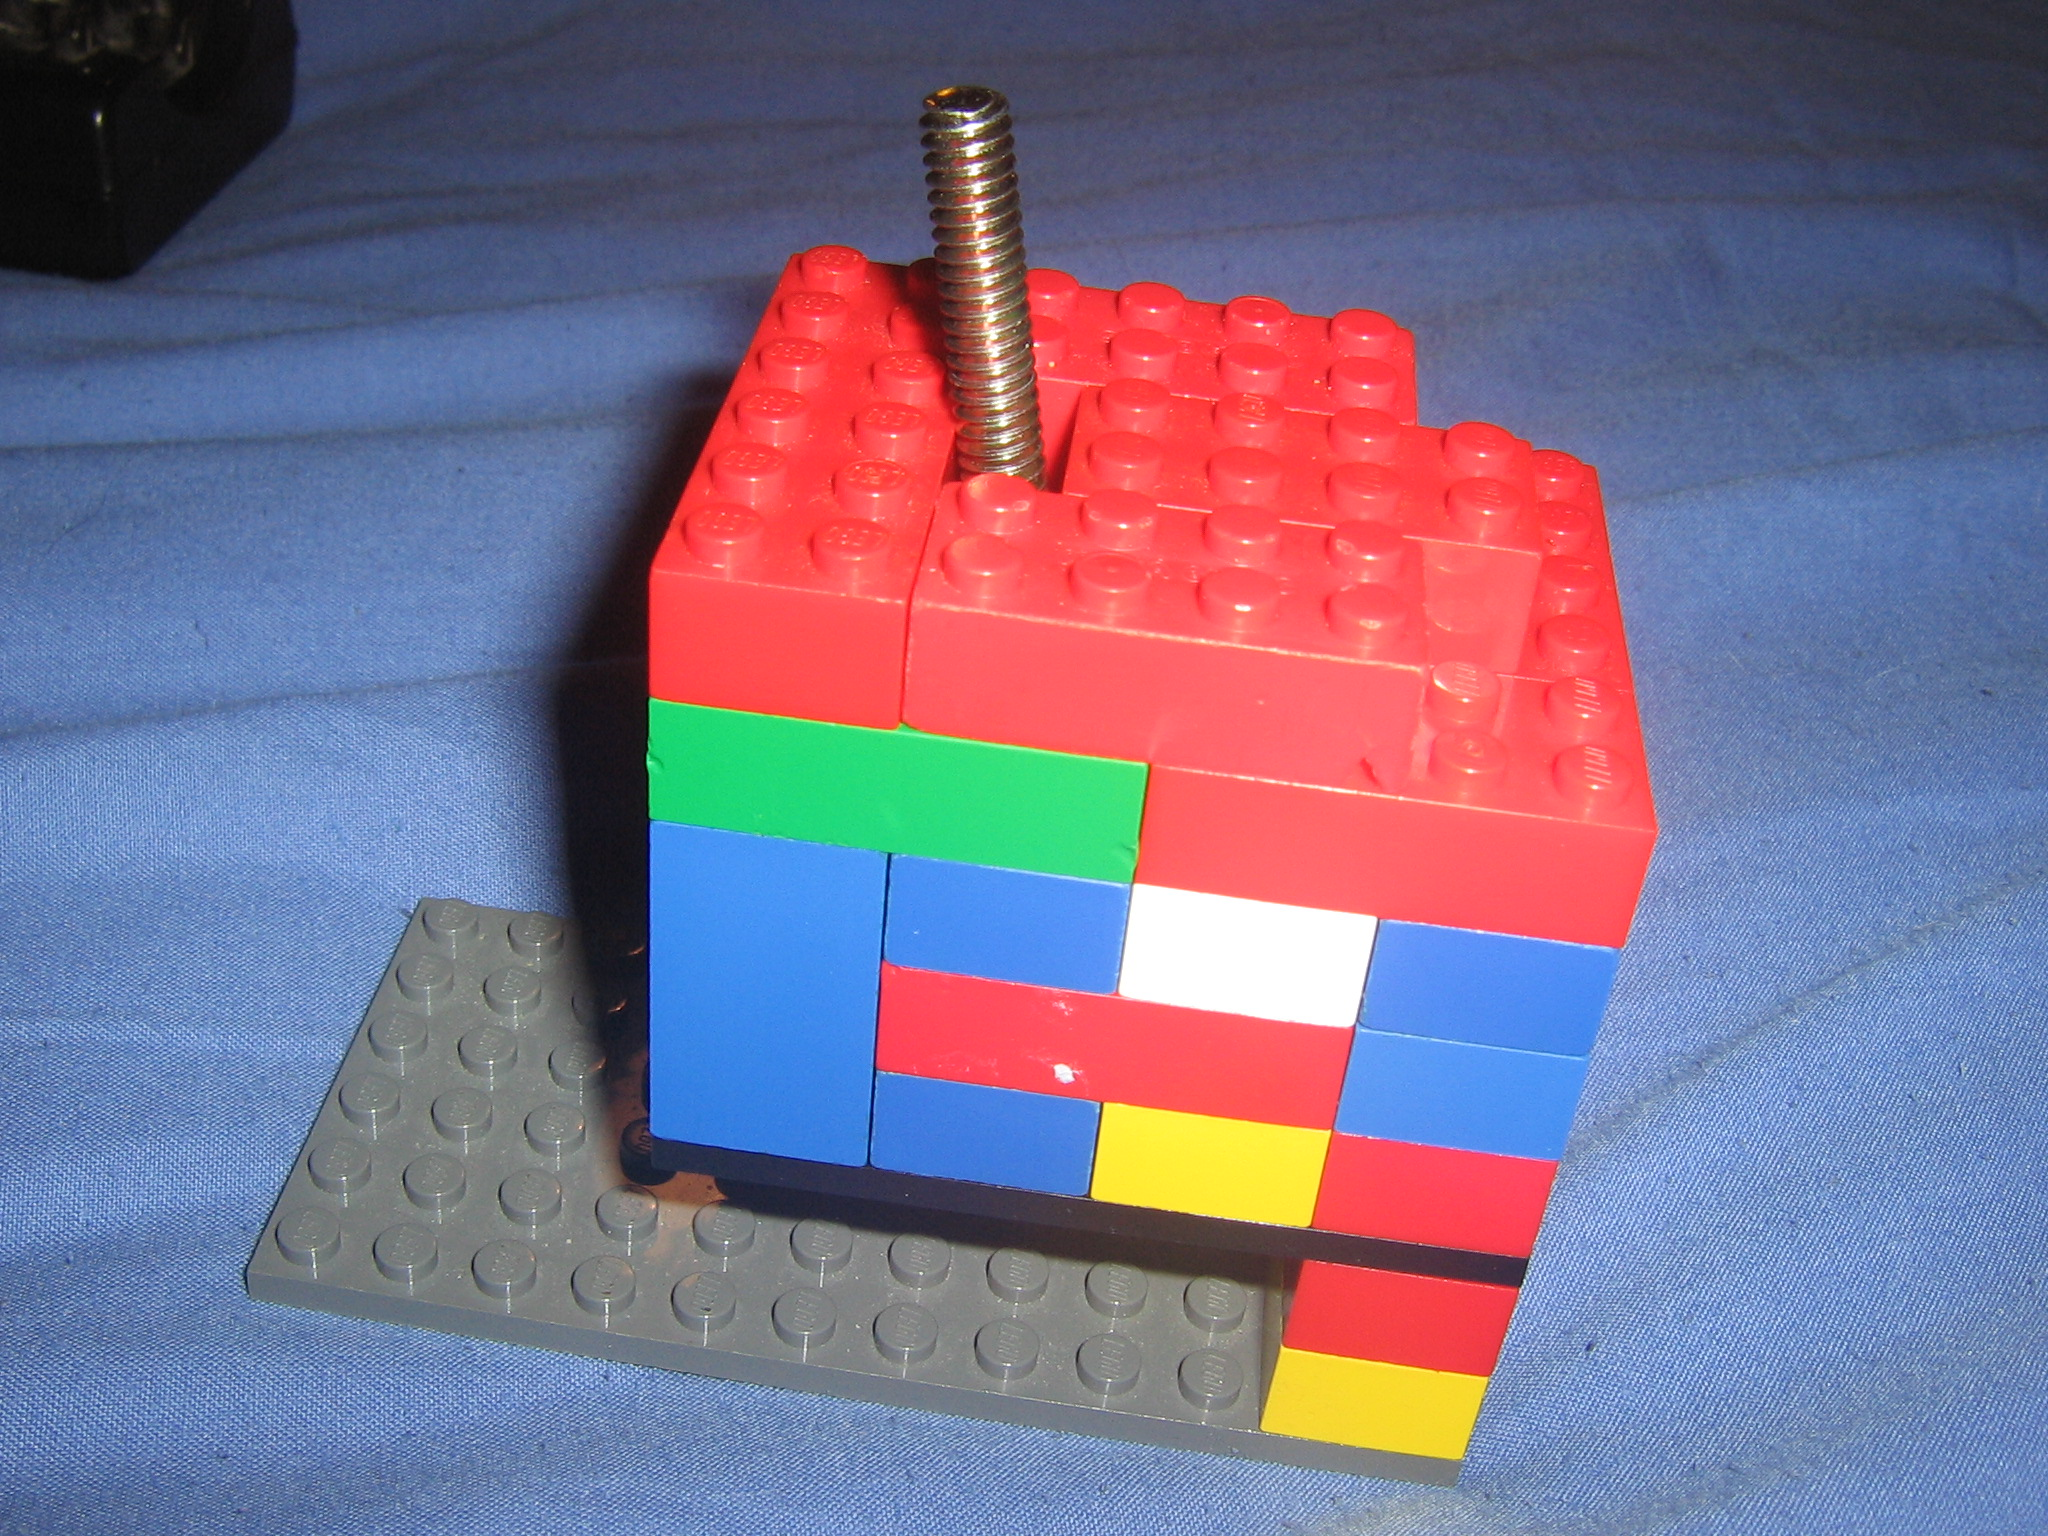 How to make a LEGO desk tripod